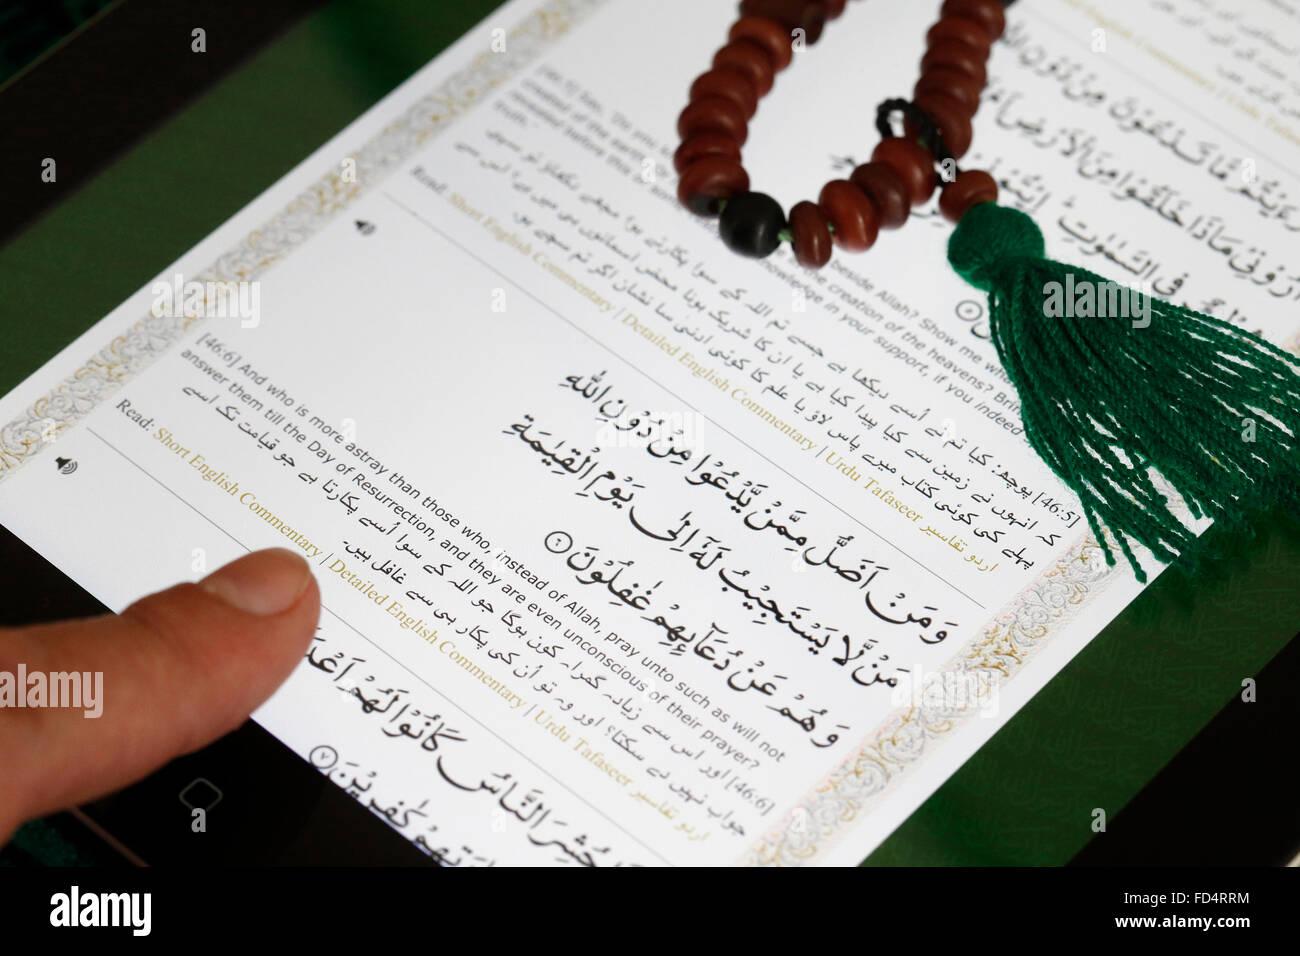 Electronic Quran on an Ipad. English translation. - Stock Image